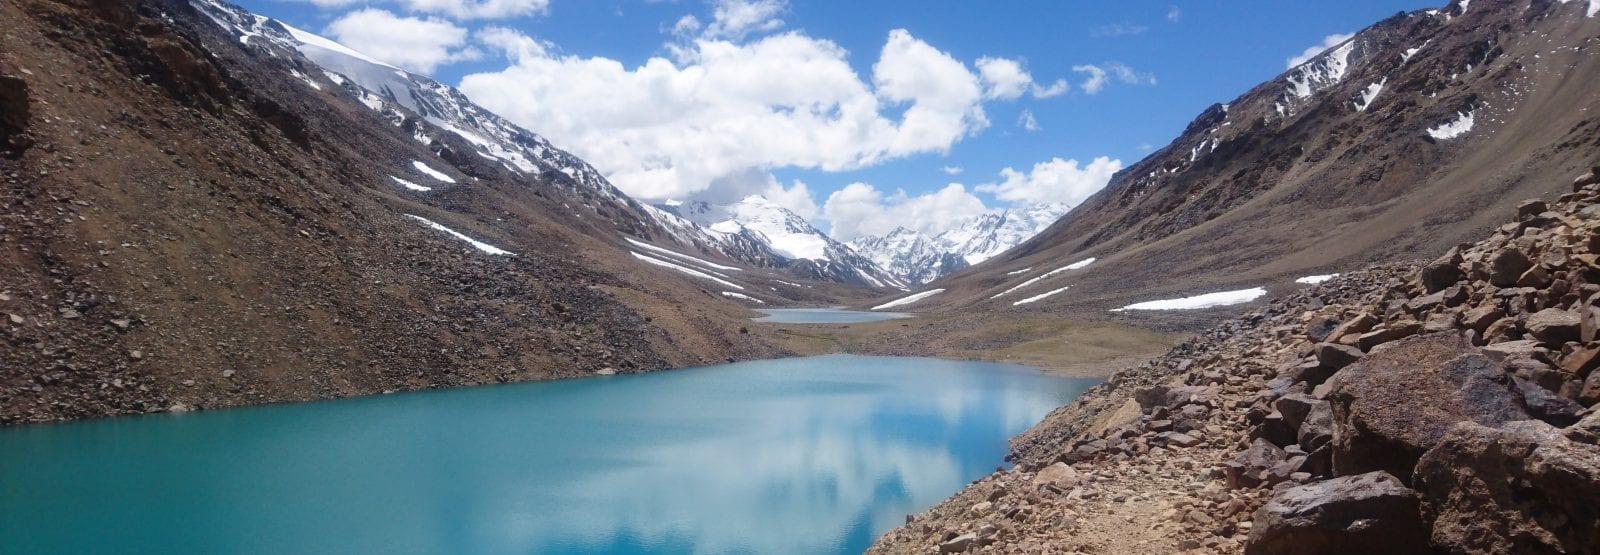 Trekking Tajikistan